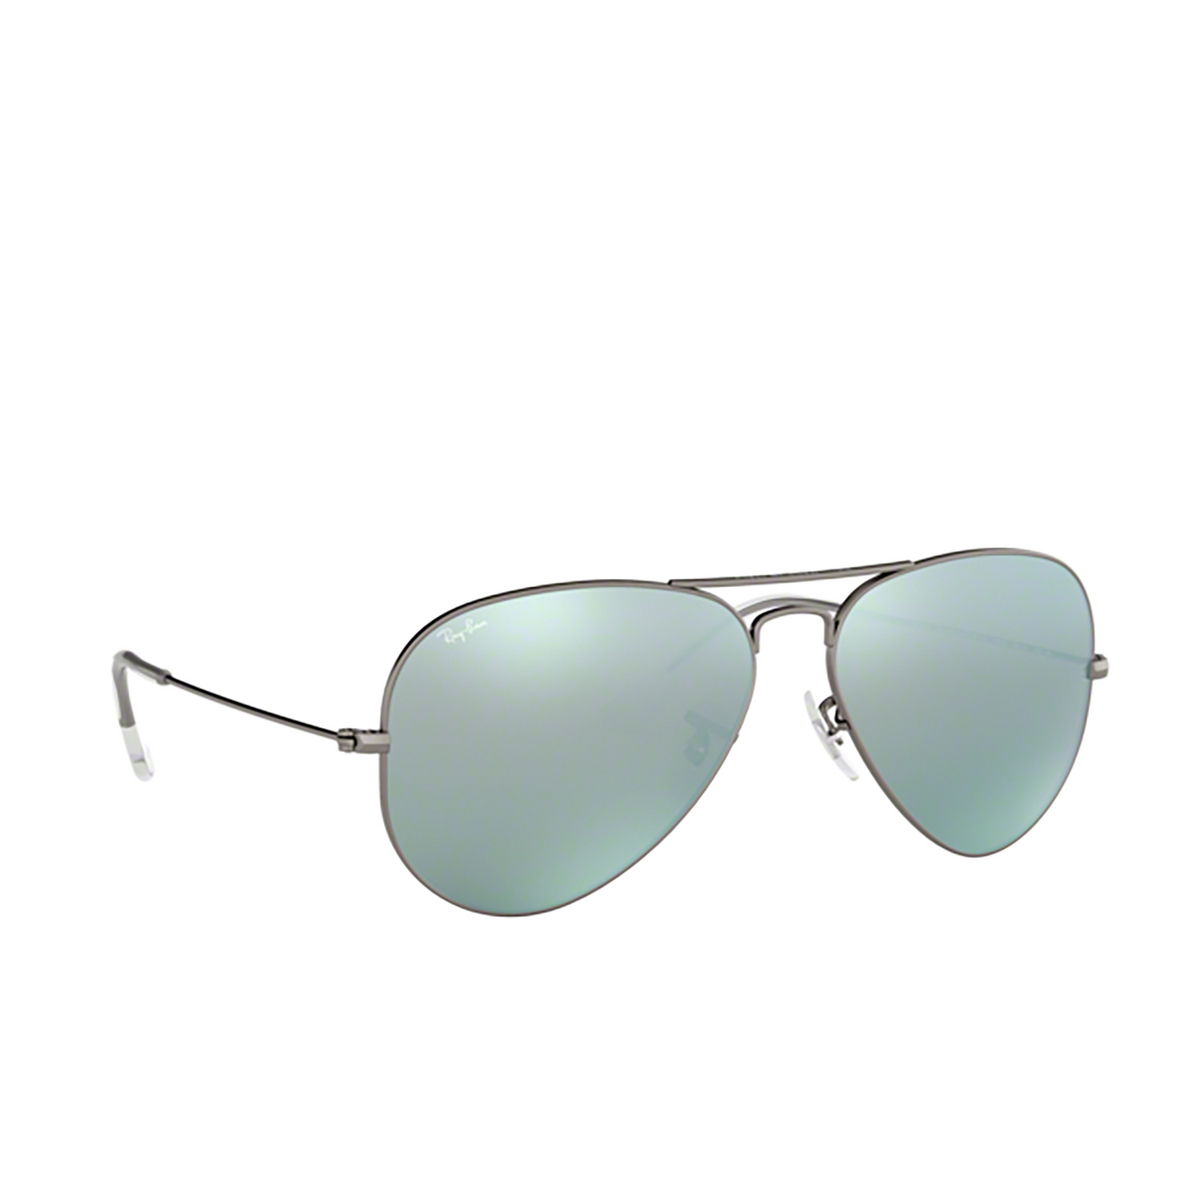 Ray-Ban® Aviator Sunglasses: Aviator Large Metal RB3025 color Matte Gunmetal 029/30 - three-quarters view.